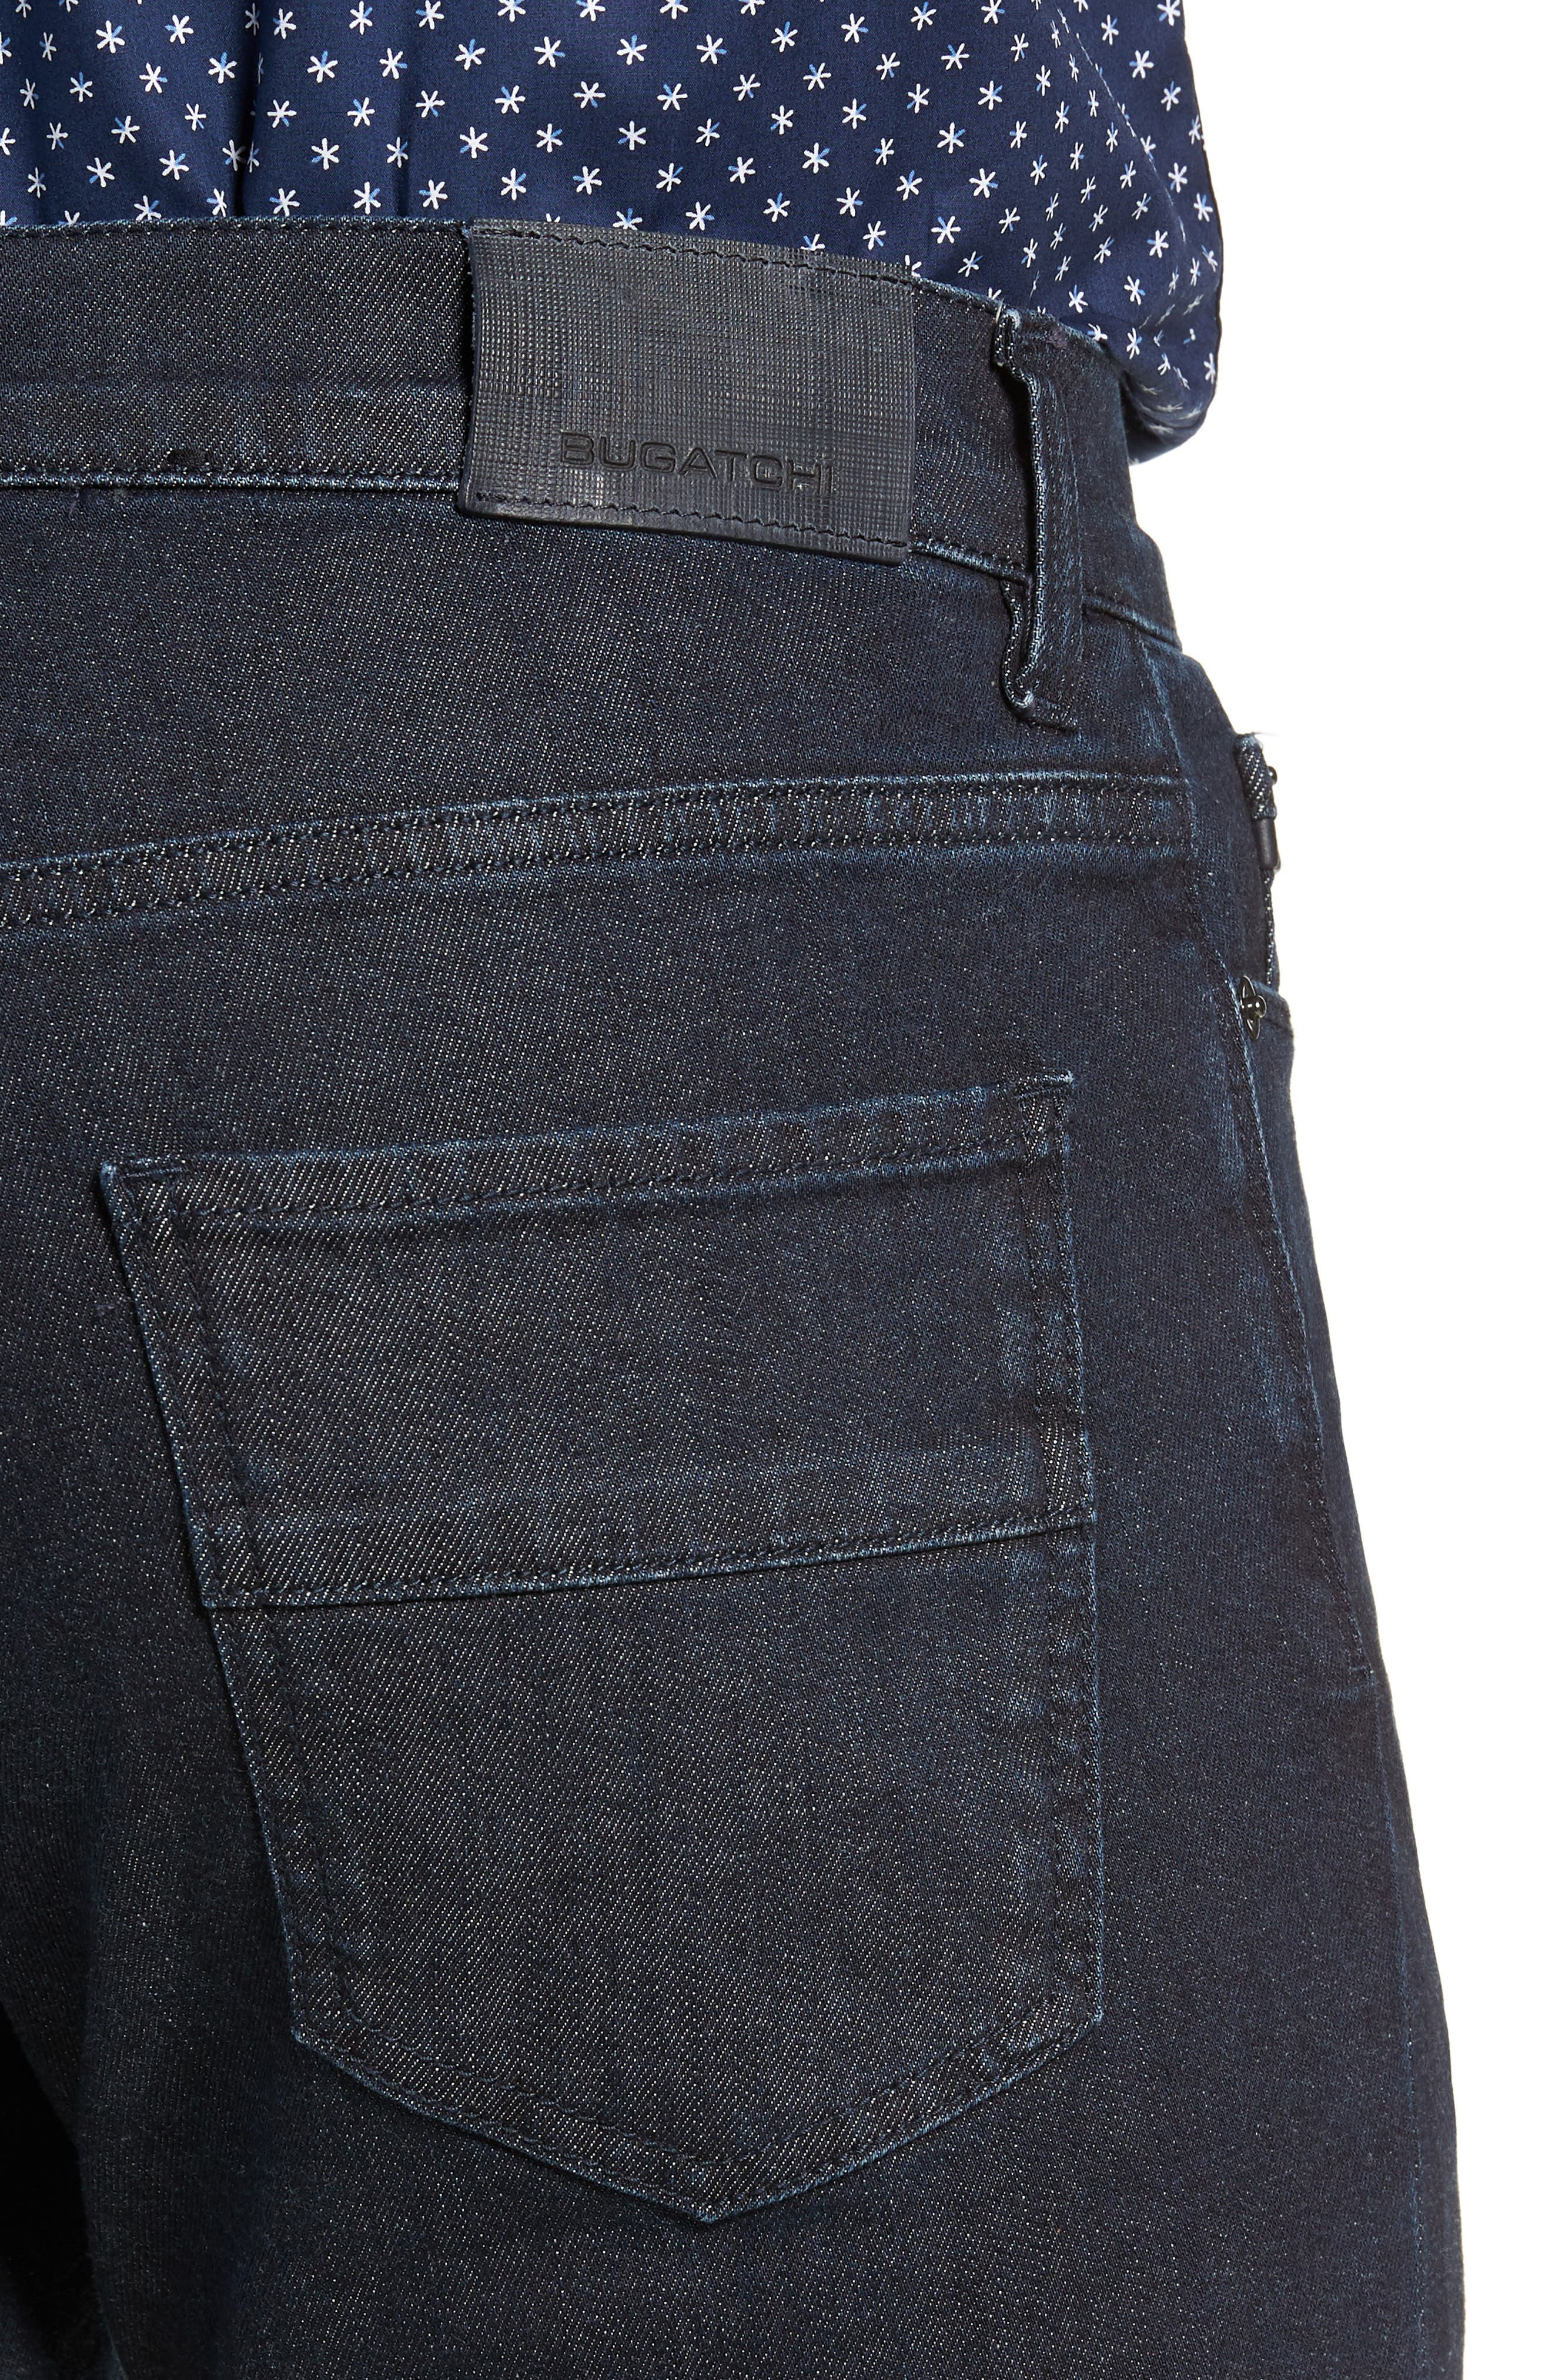 Slim Fit Jeans,                             Alternate thumbnail 4, color,                             SMOKE